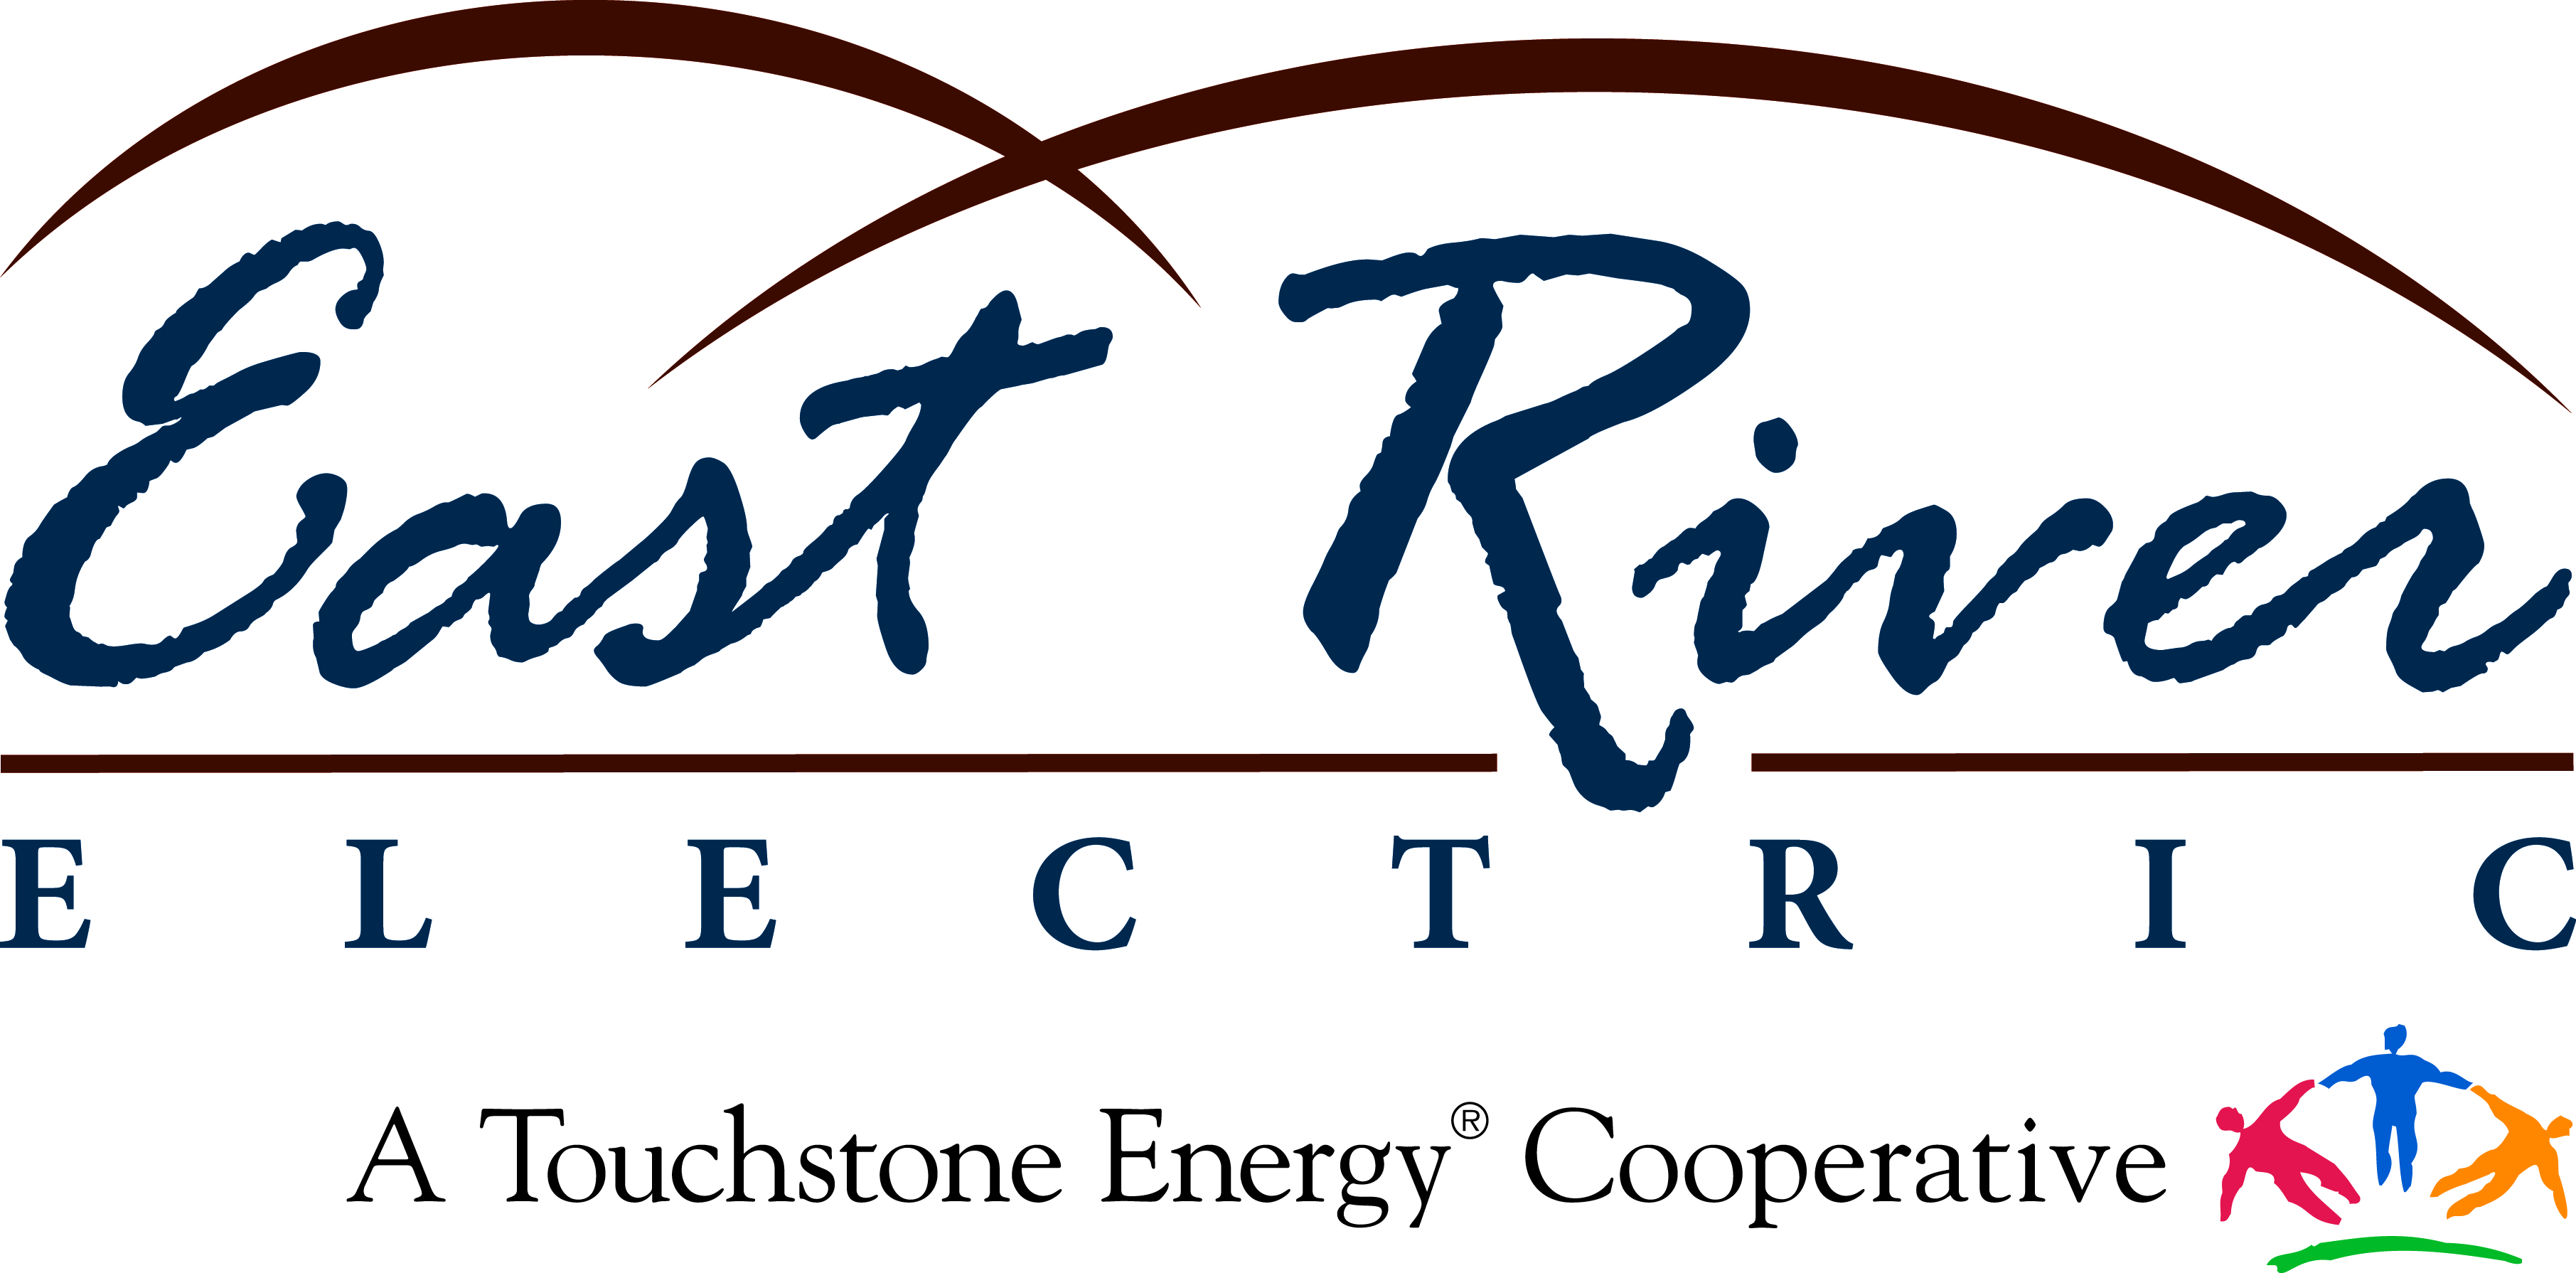 https://growthzonesitesprod.azureedge.net/wp-content/uploads/sites/1494/2021/06/East-River-Electric-Logo-2010.jpg